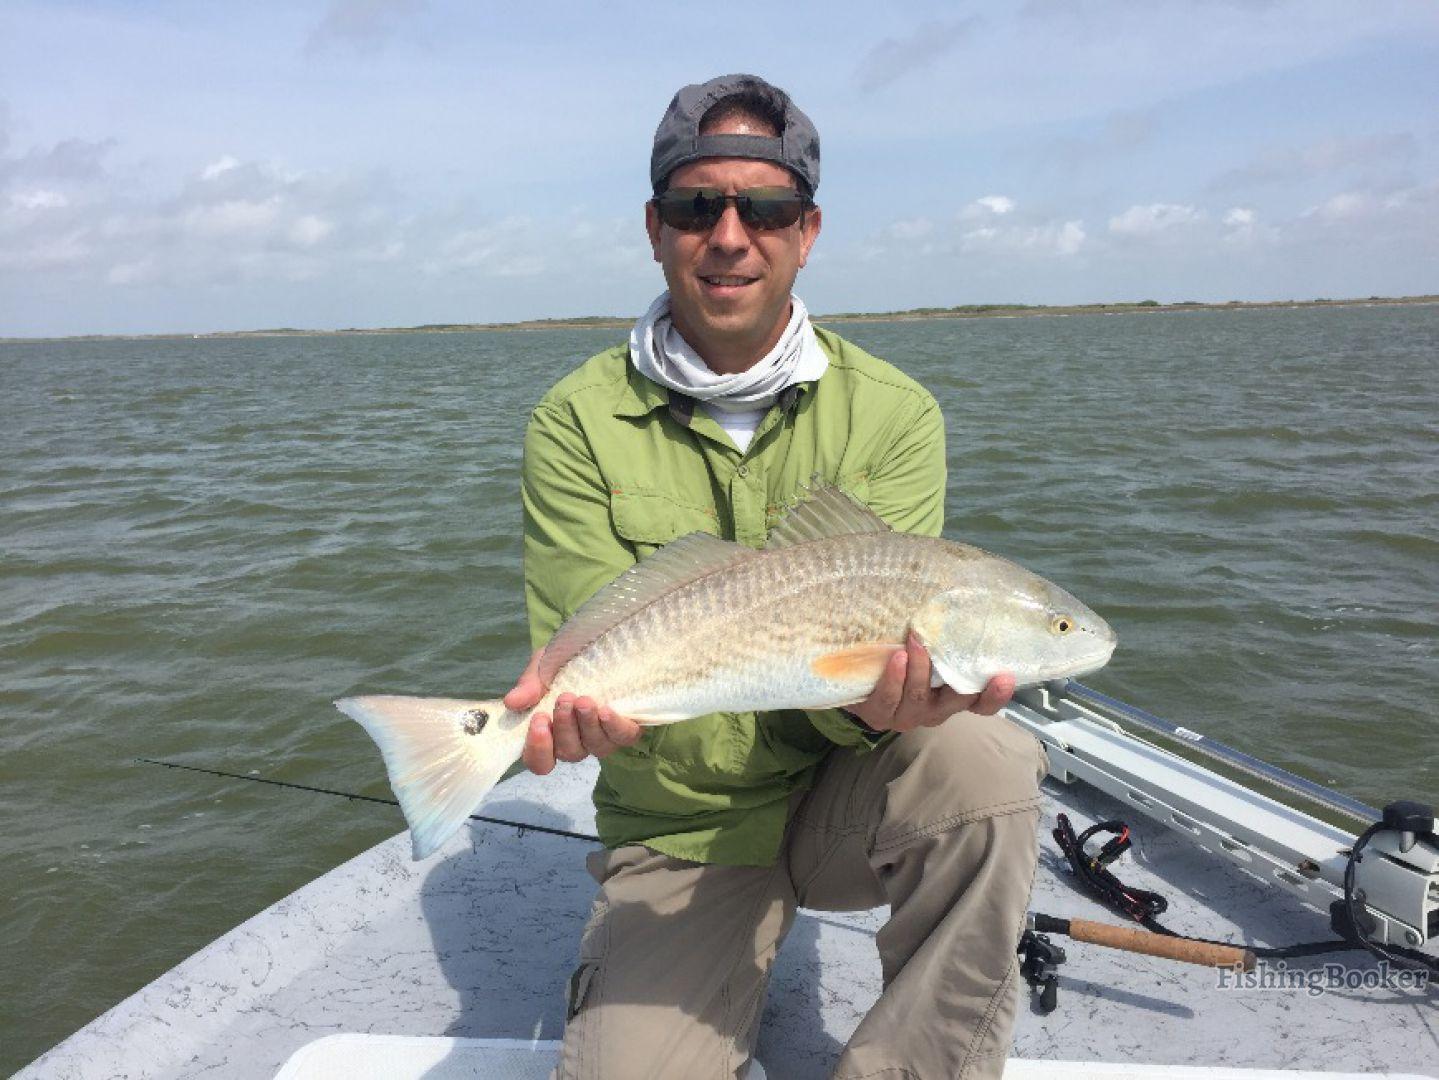 Hunter bay charters no fish no pay corpus christi texas for Corpus christi fishing guides